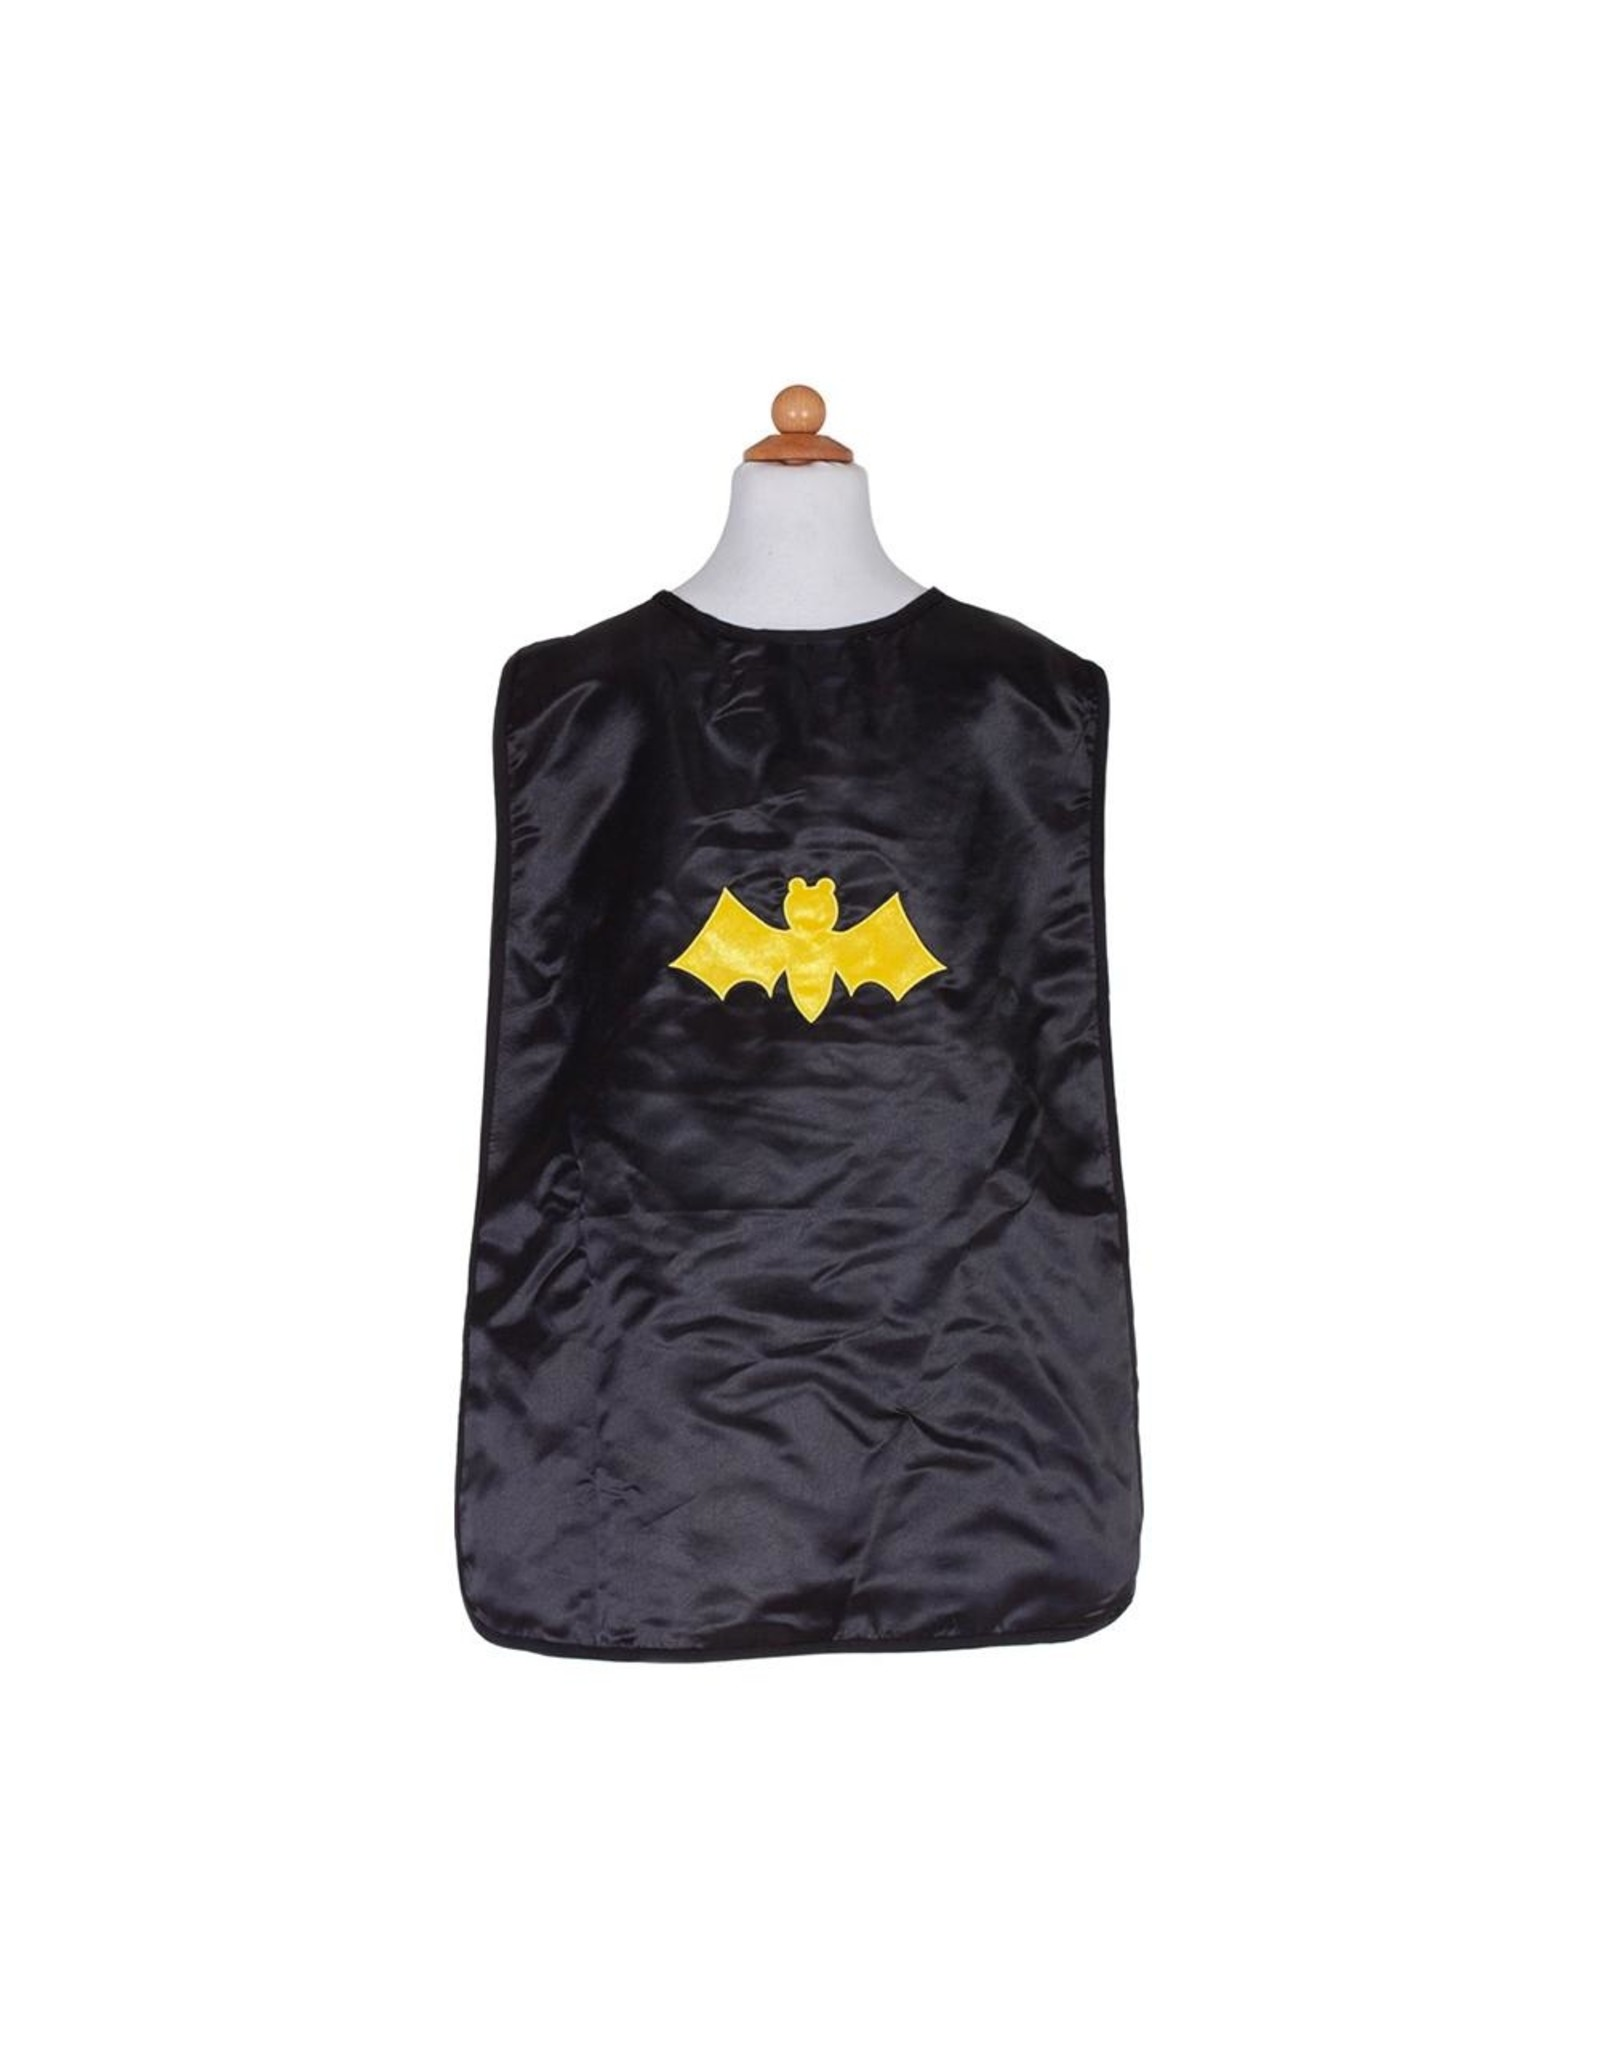 Great Pretenders Reversible Superhero/Bat Tunic With Cape & Mask  Size 4-7